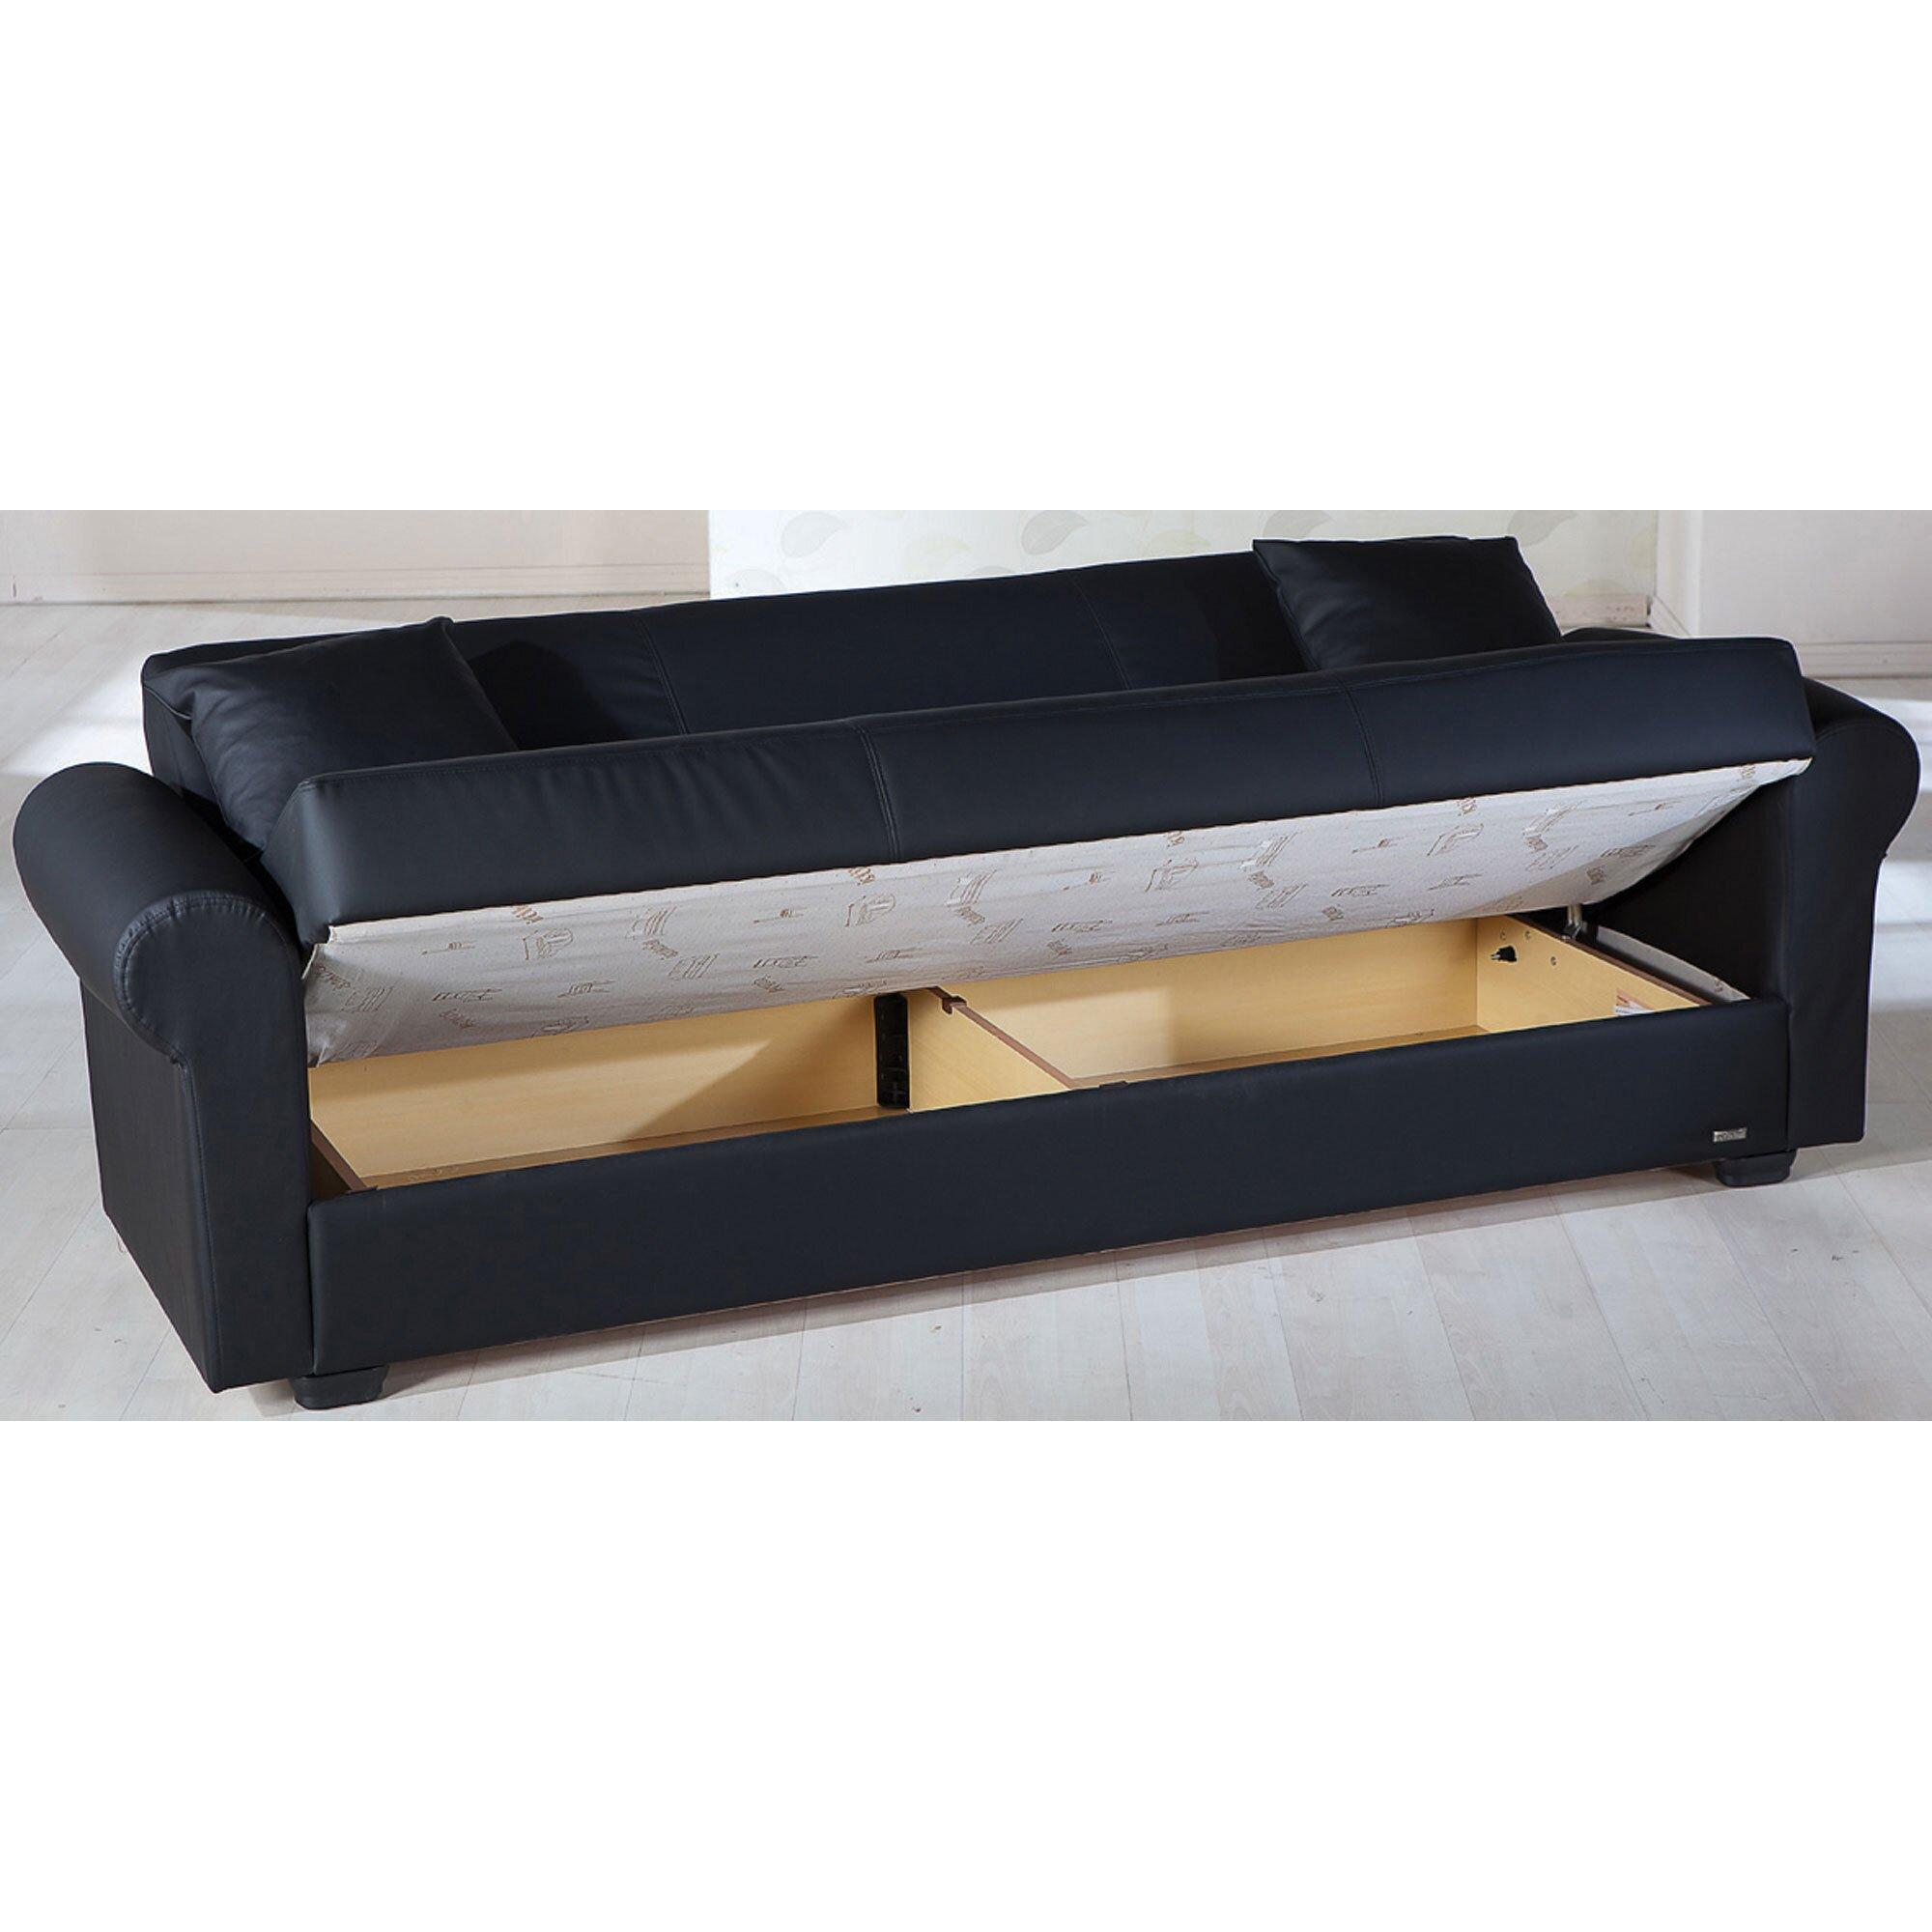 Istikbal Floris 3 Seat Sleeper Sofa u0026 Reviews : Wayfair